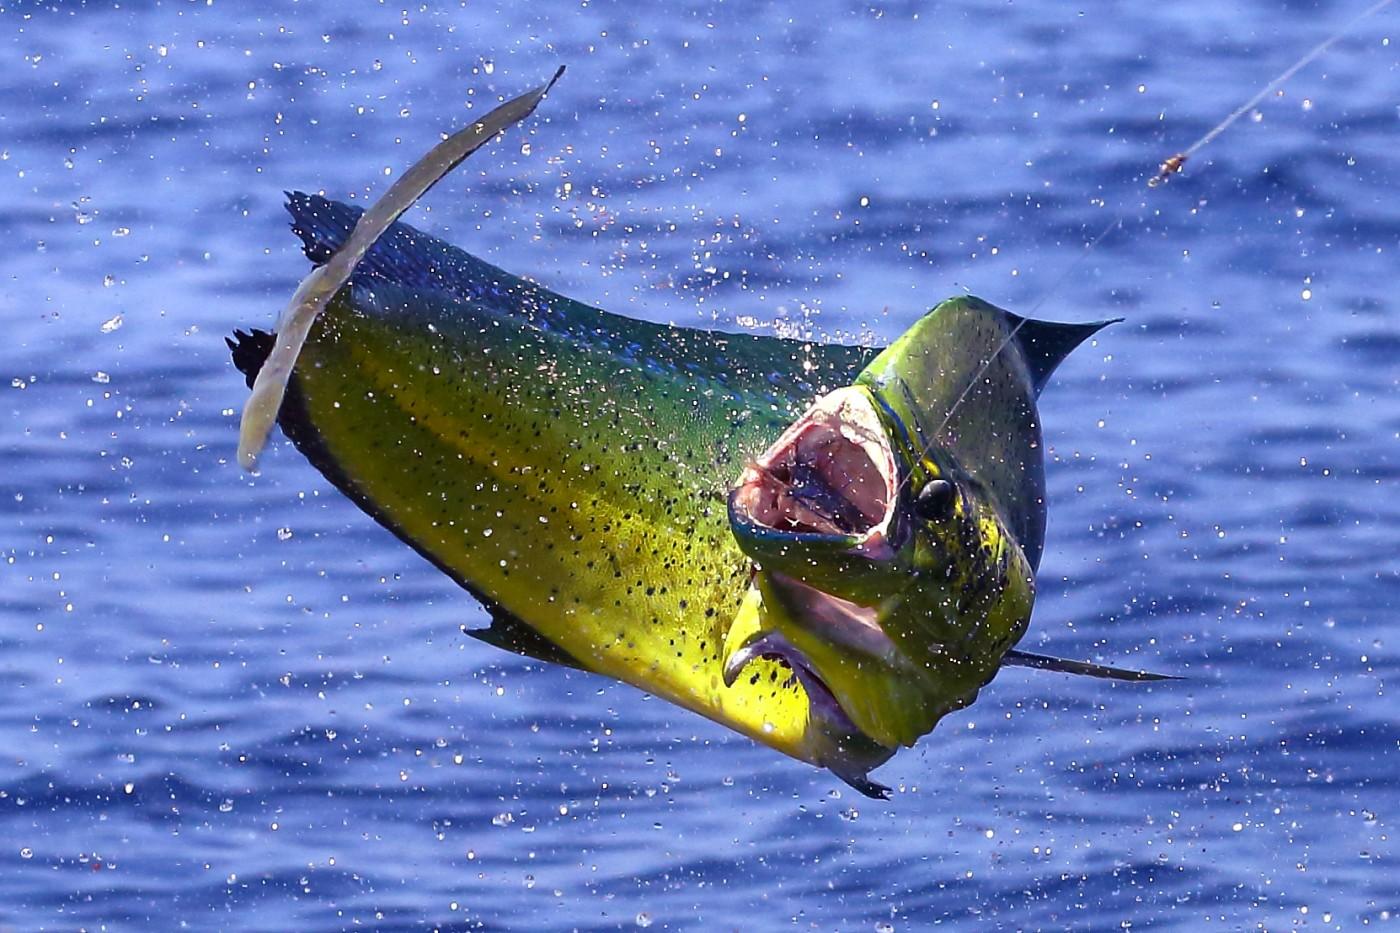 Gulf Coast Fishing Spots for Offshore Fishing